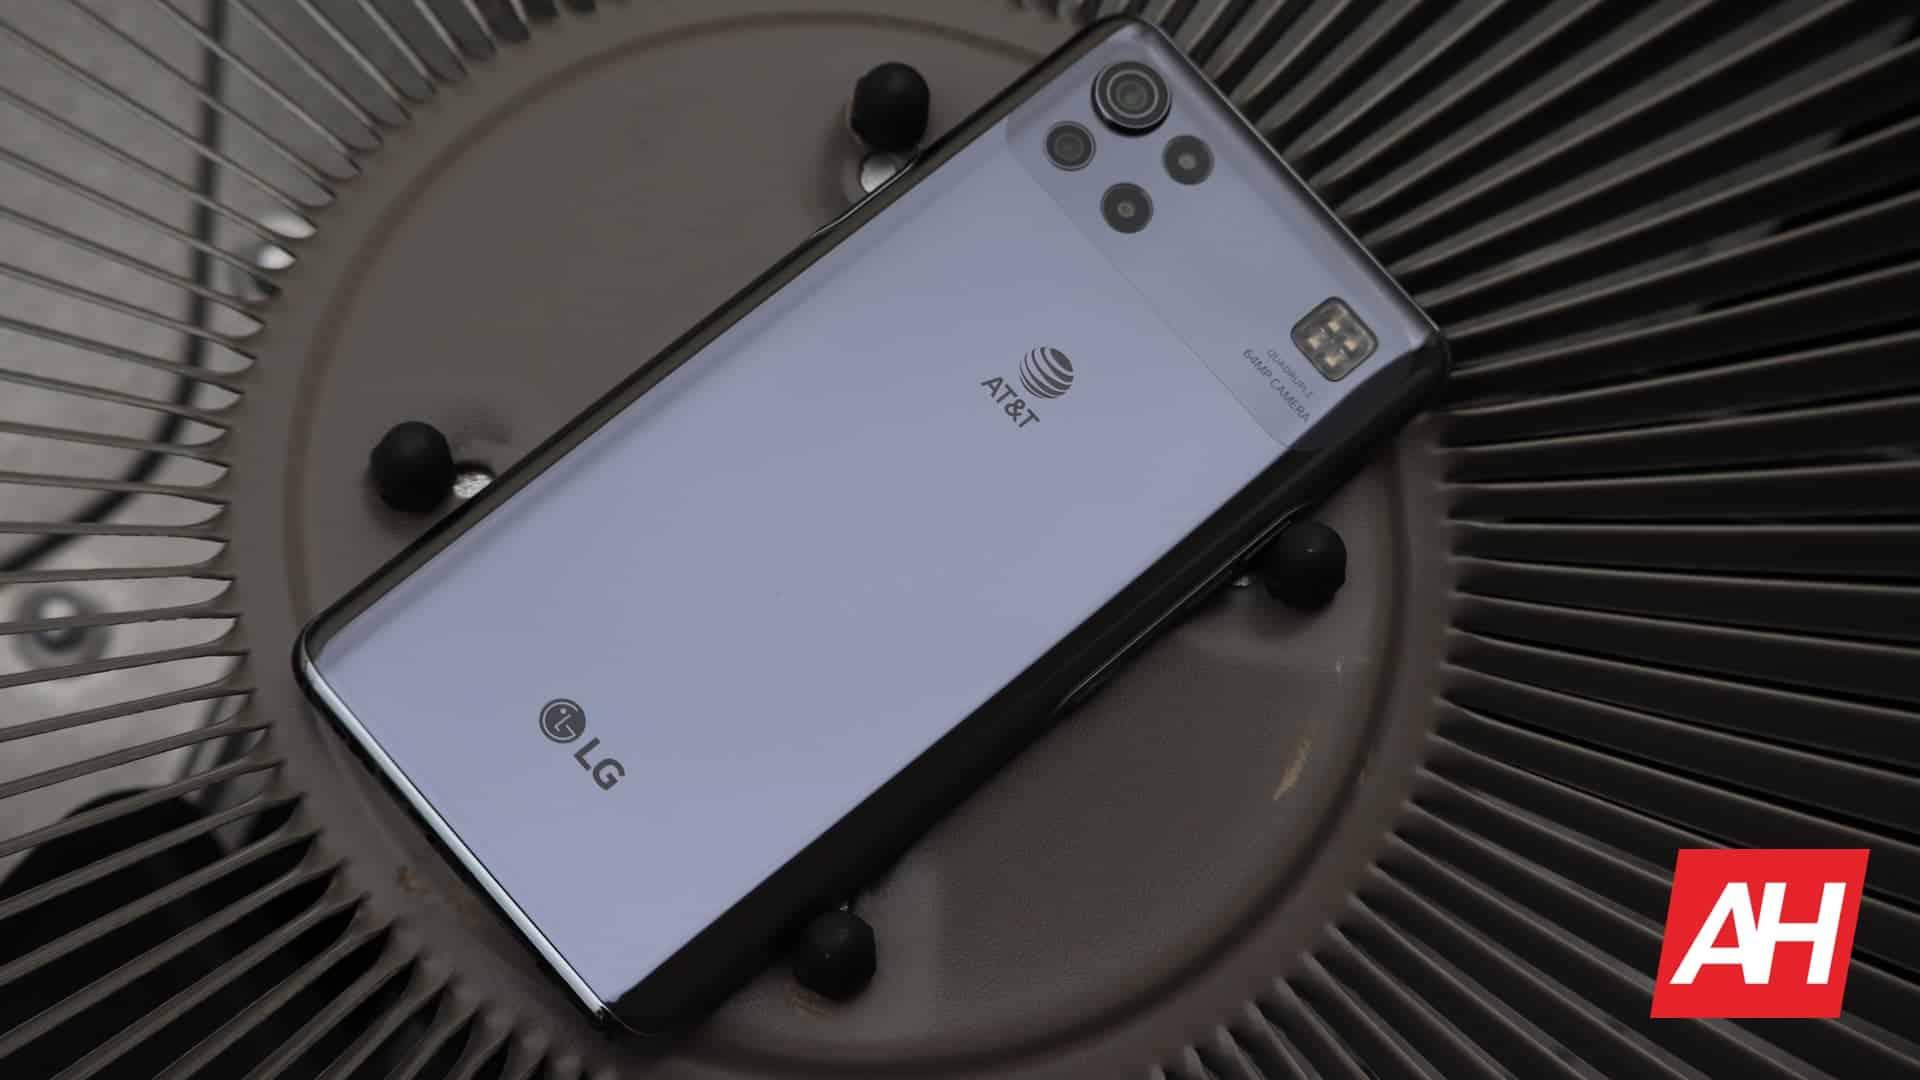 01 LG K92 5G Review Hardware DG AH 2020